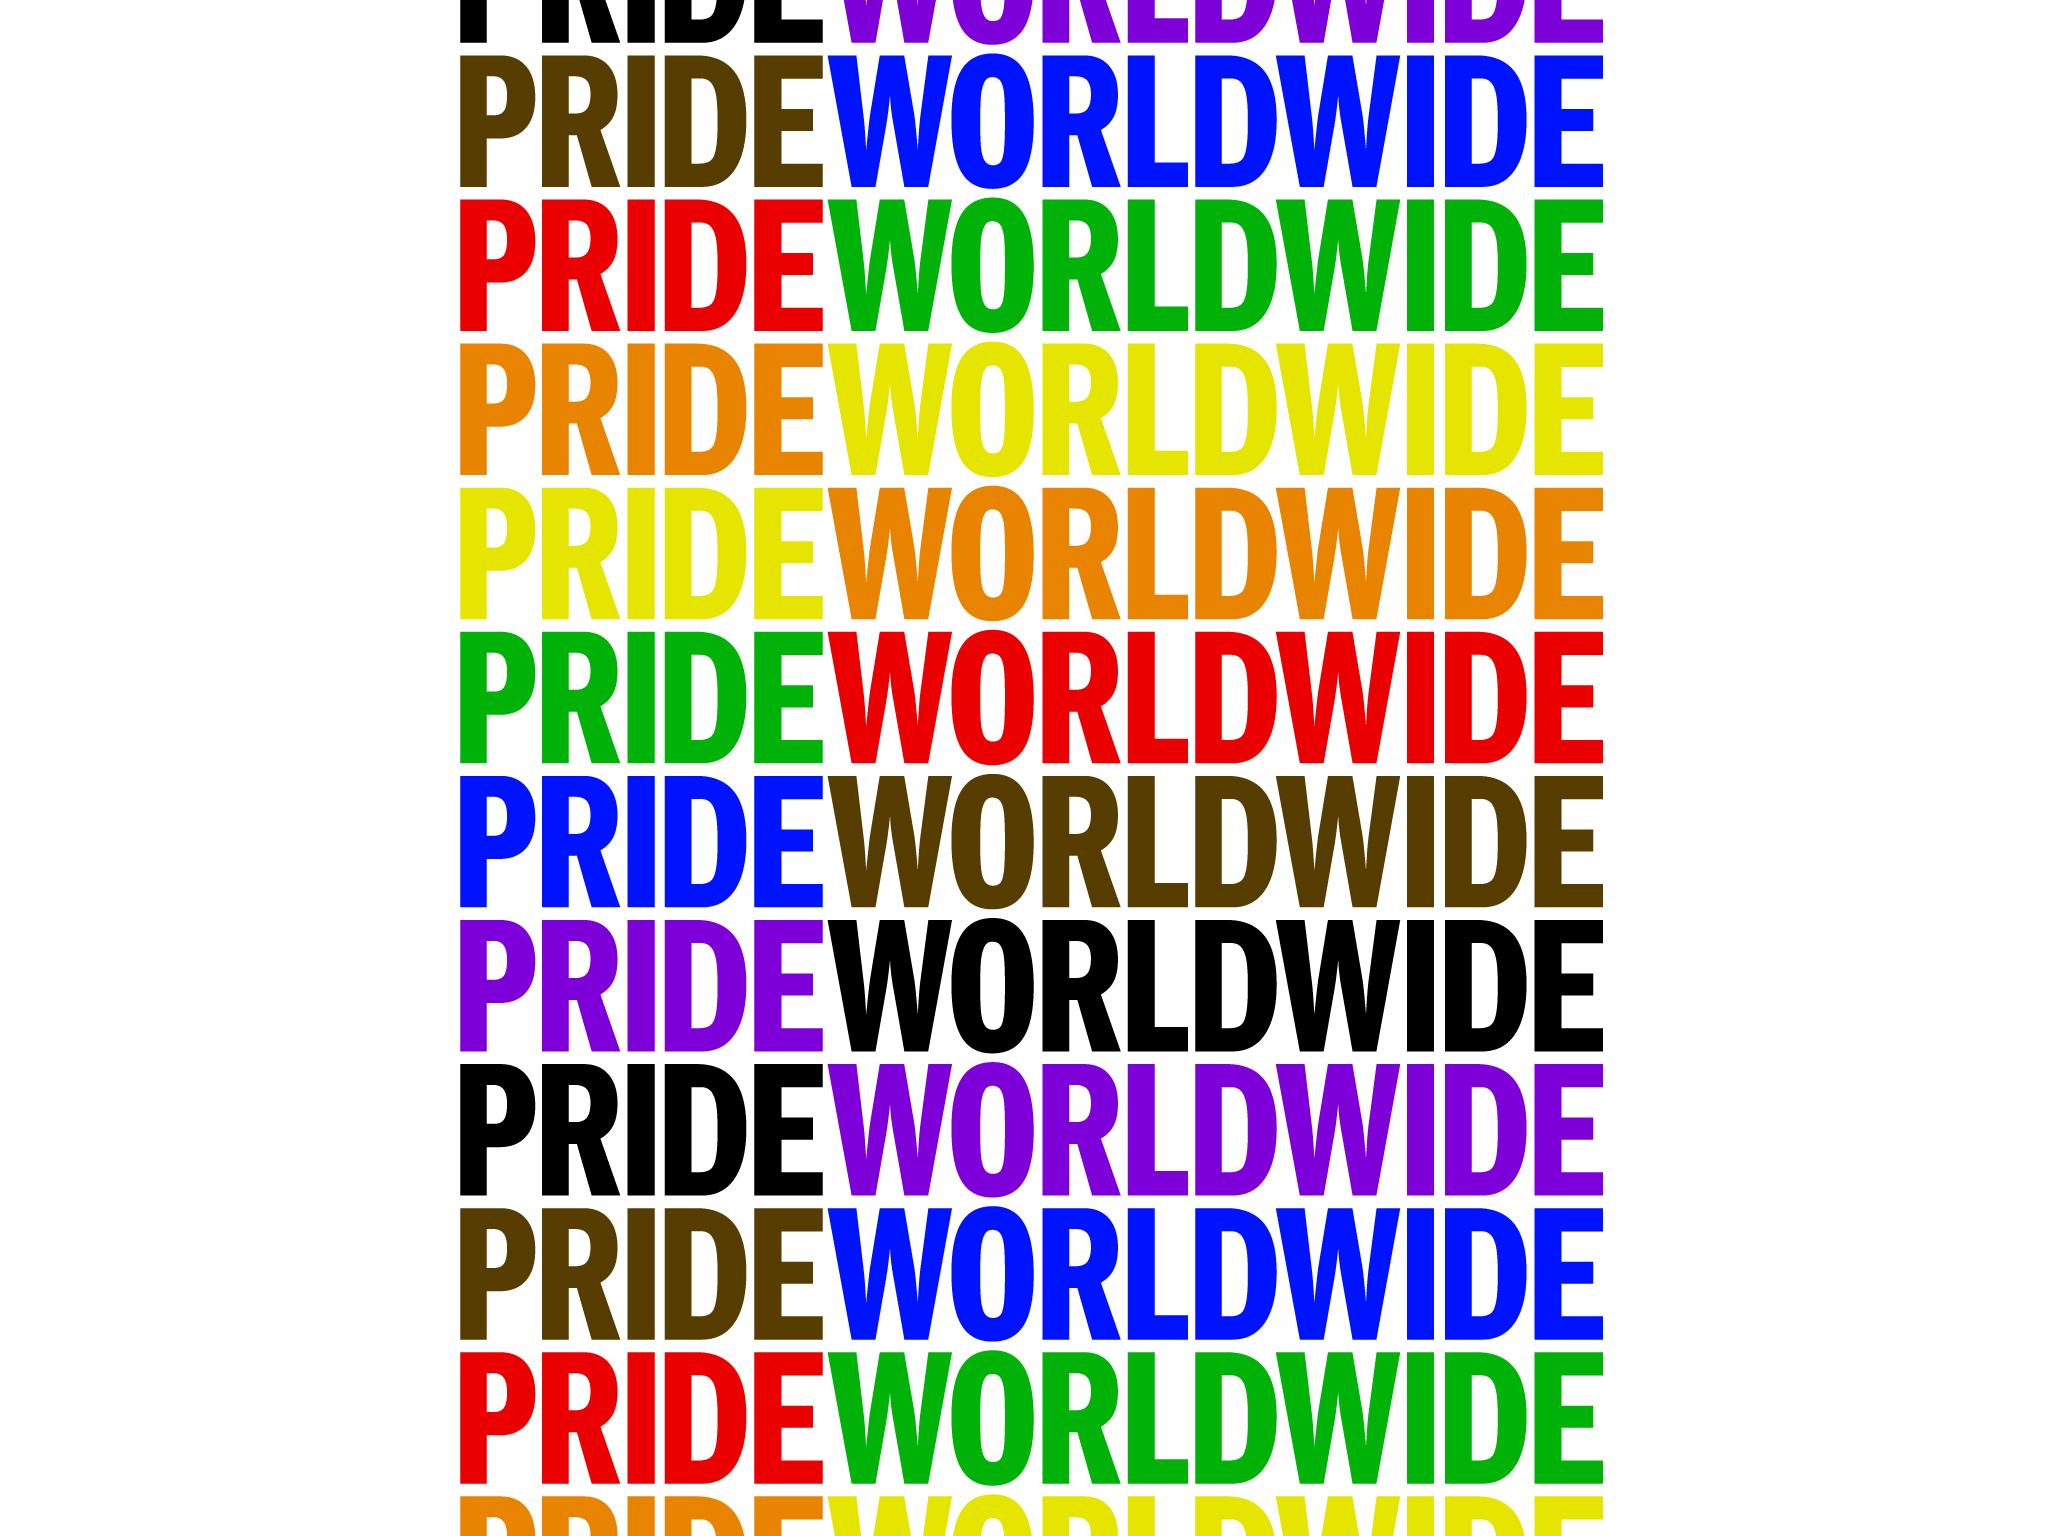 Pride Worldwide